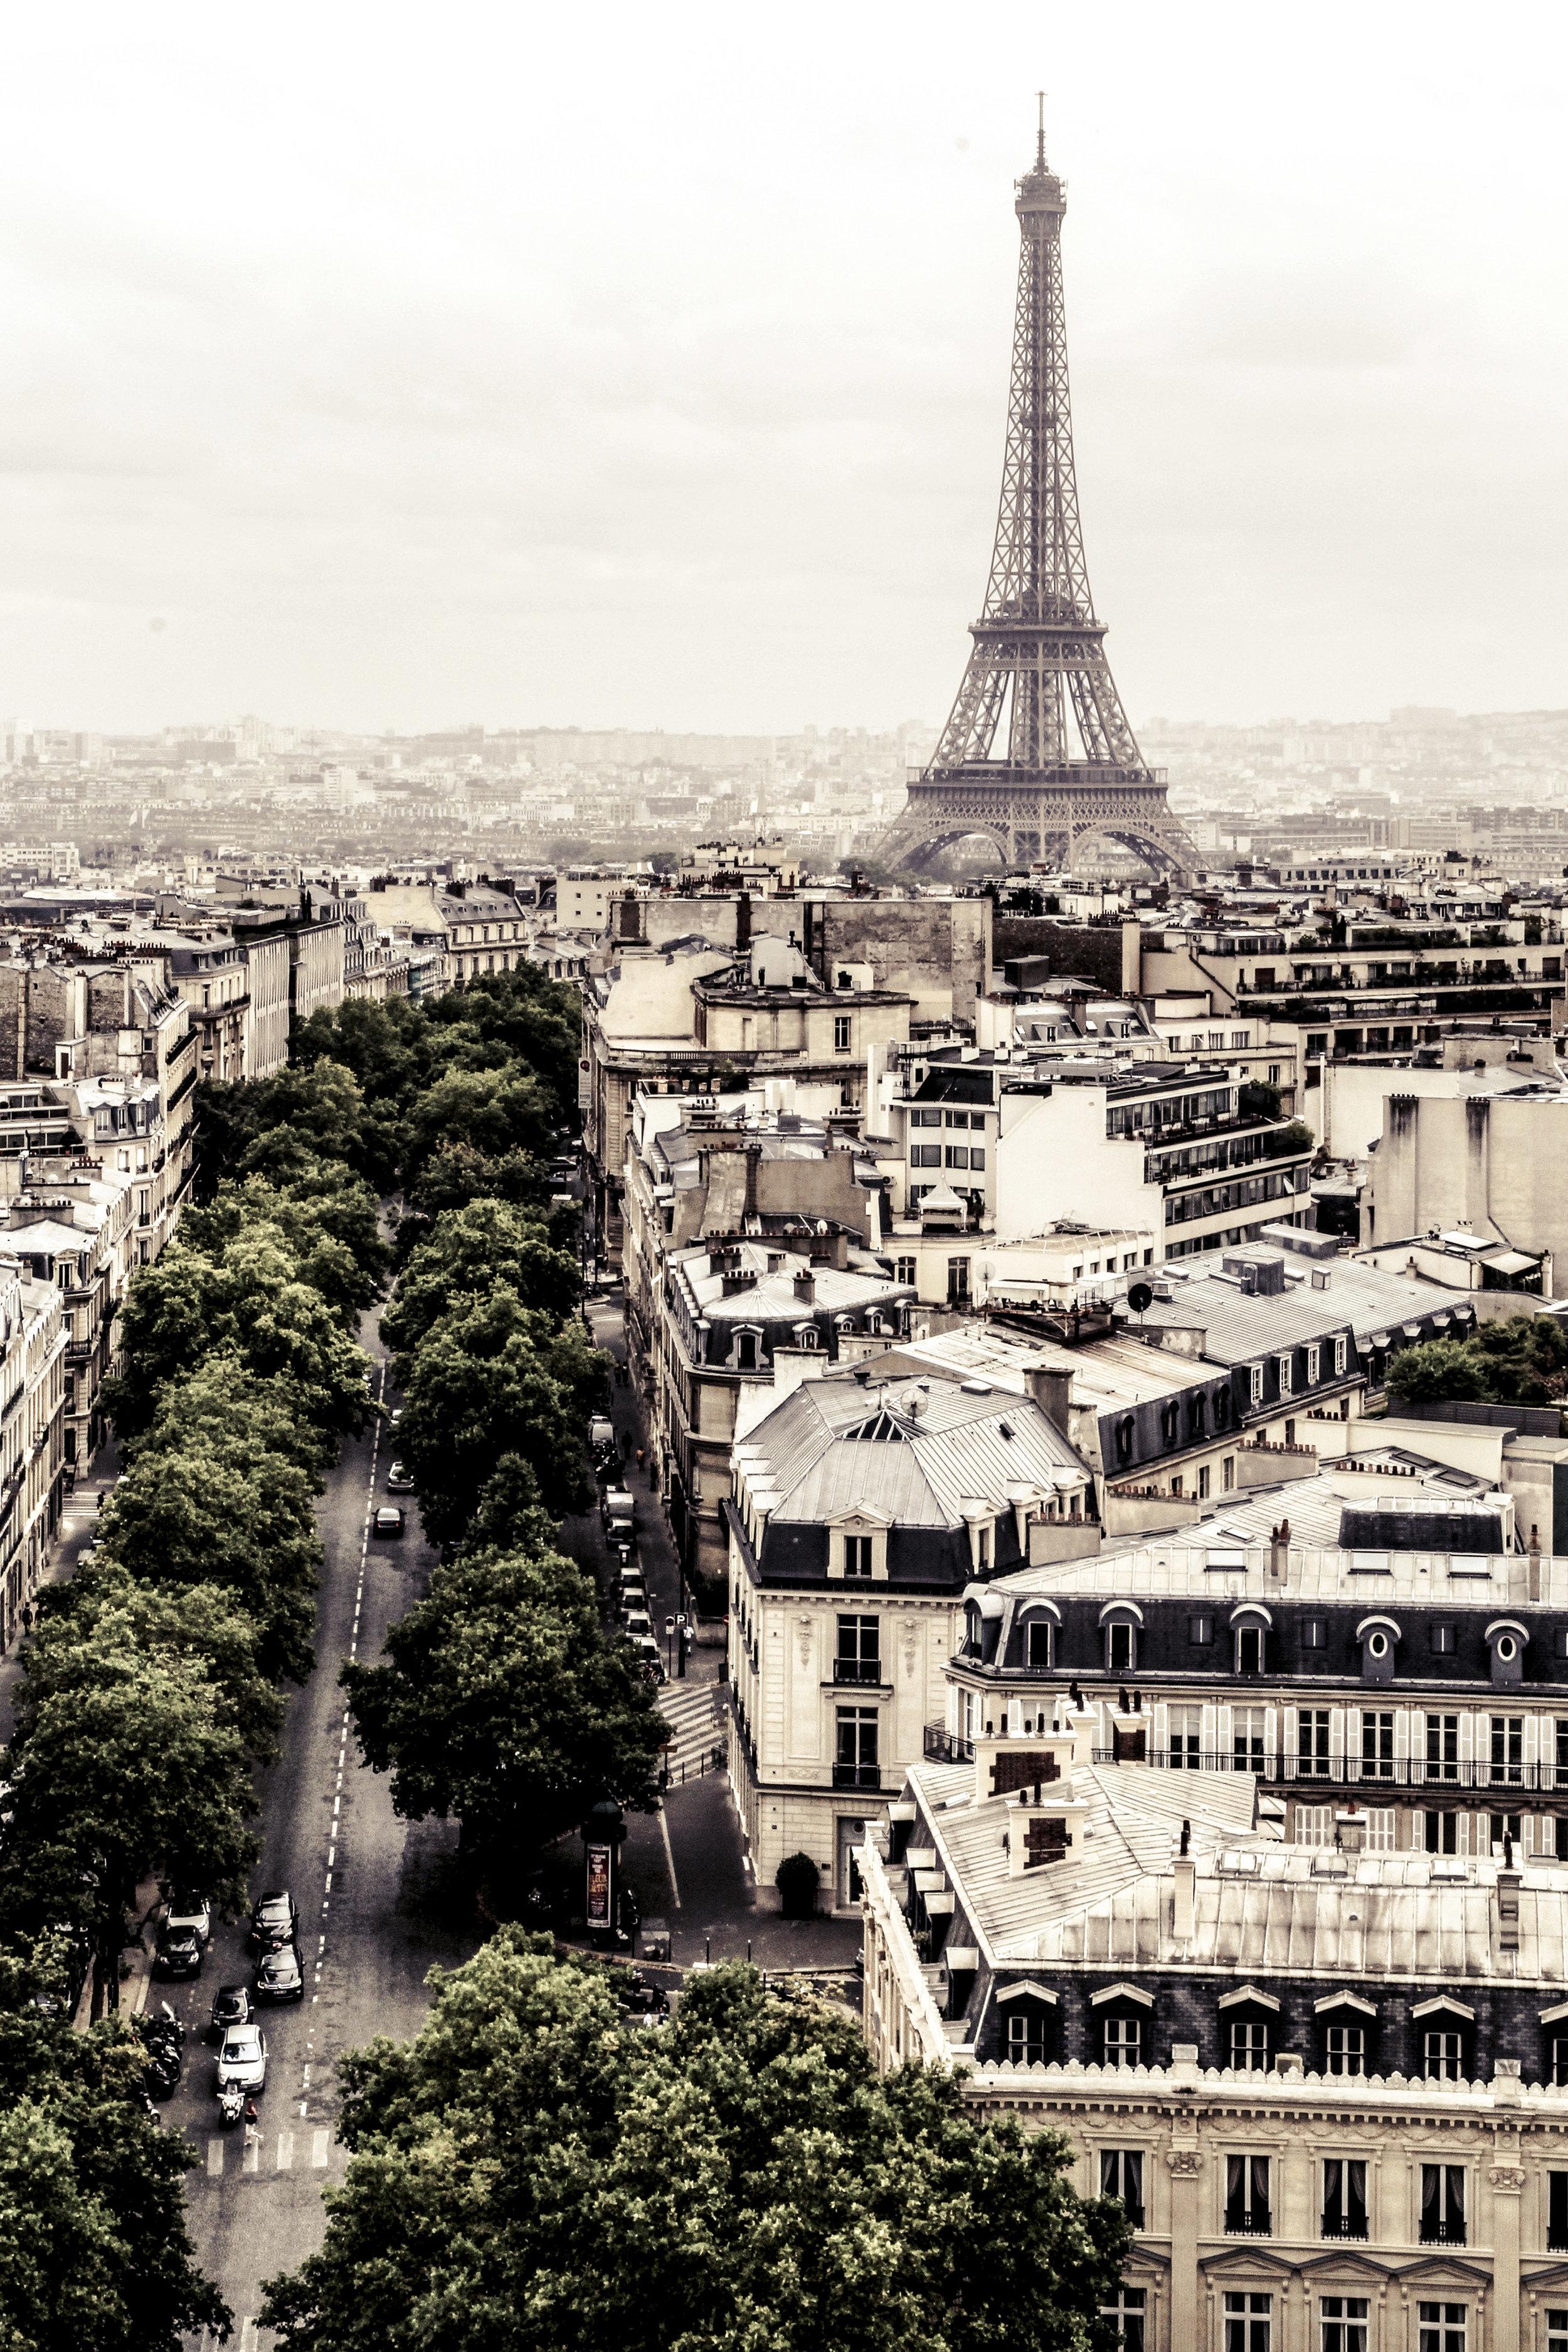 2015 Scene Over Paris-72 dpi.jpg